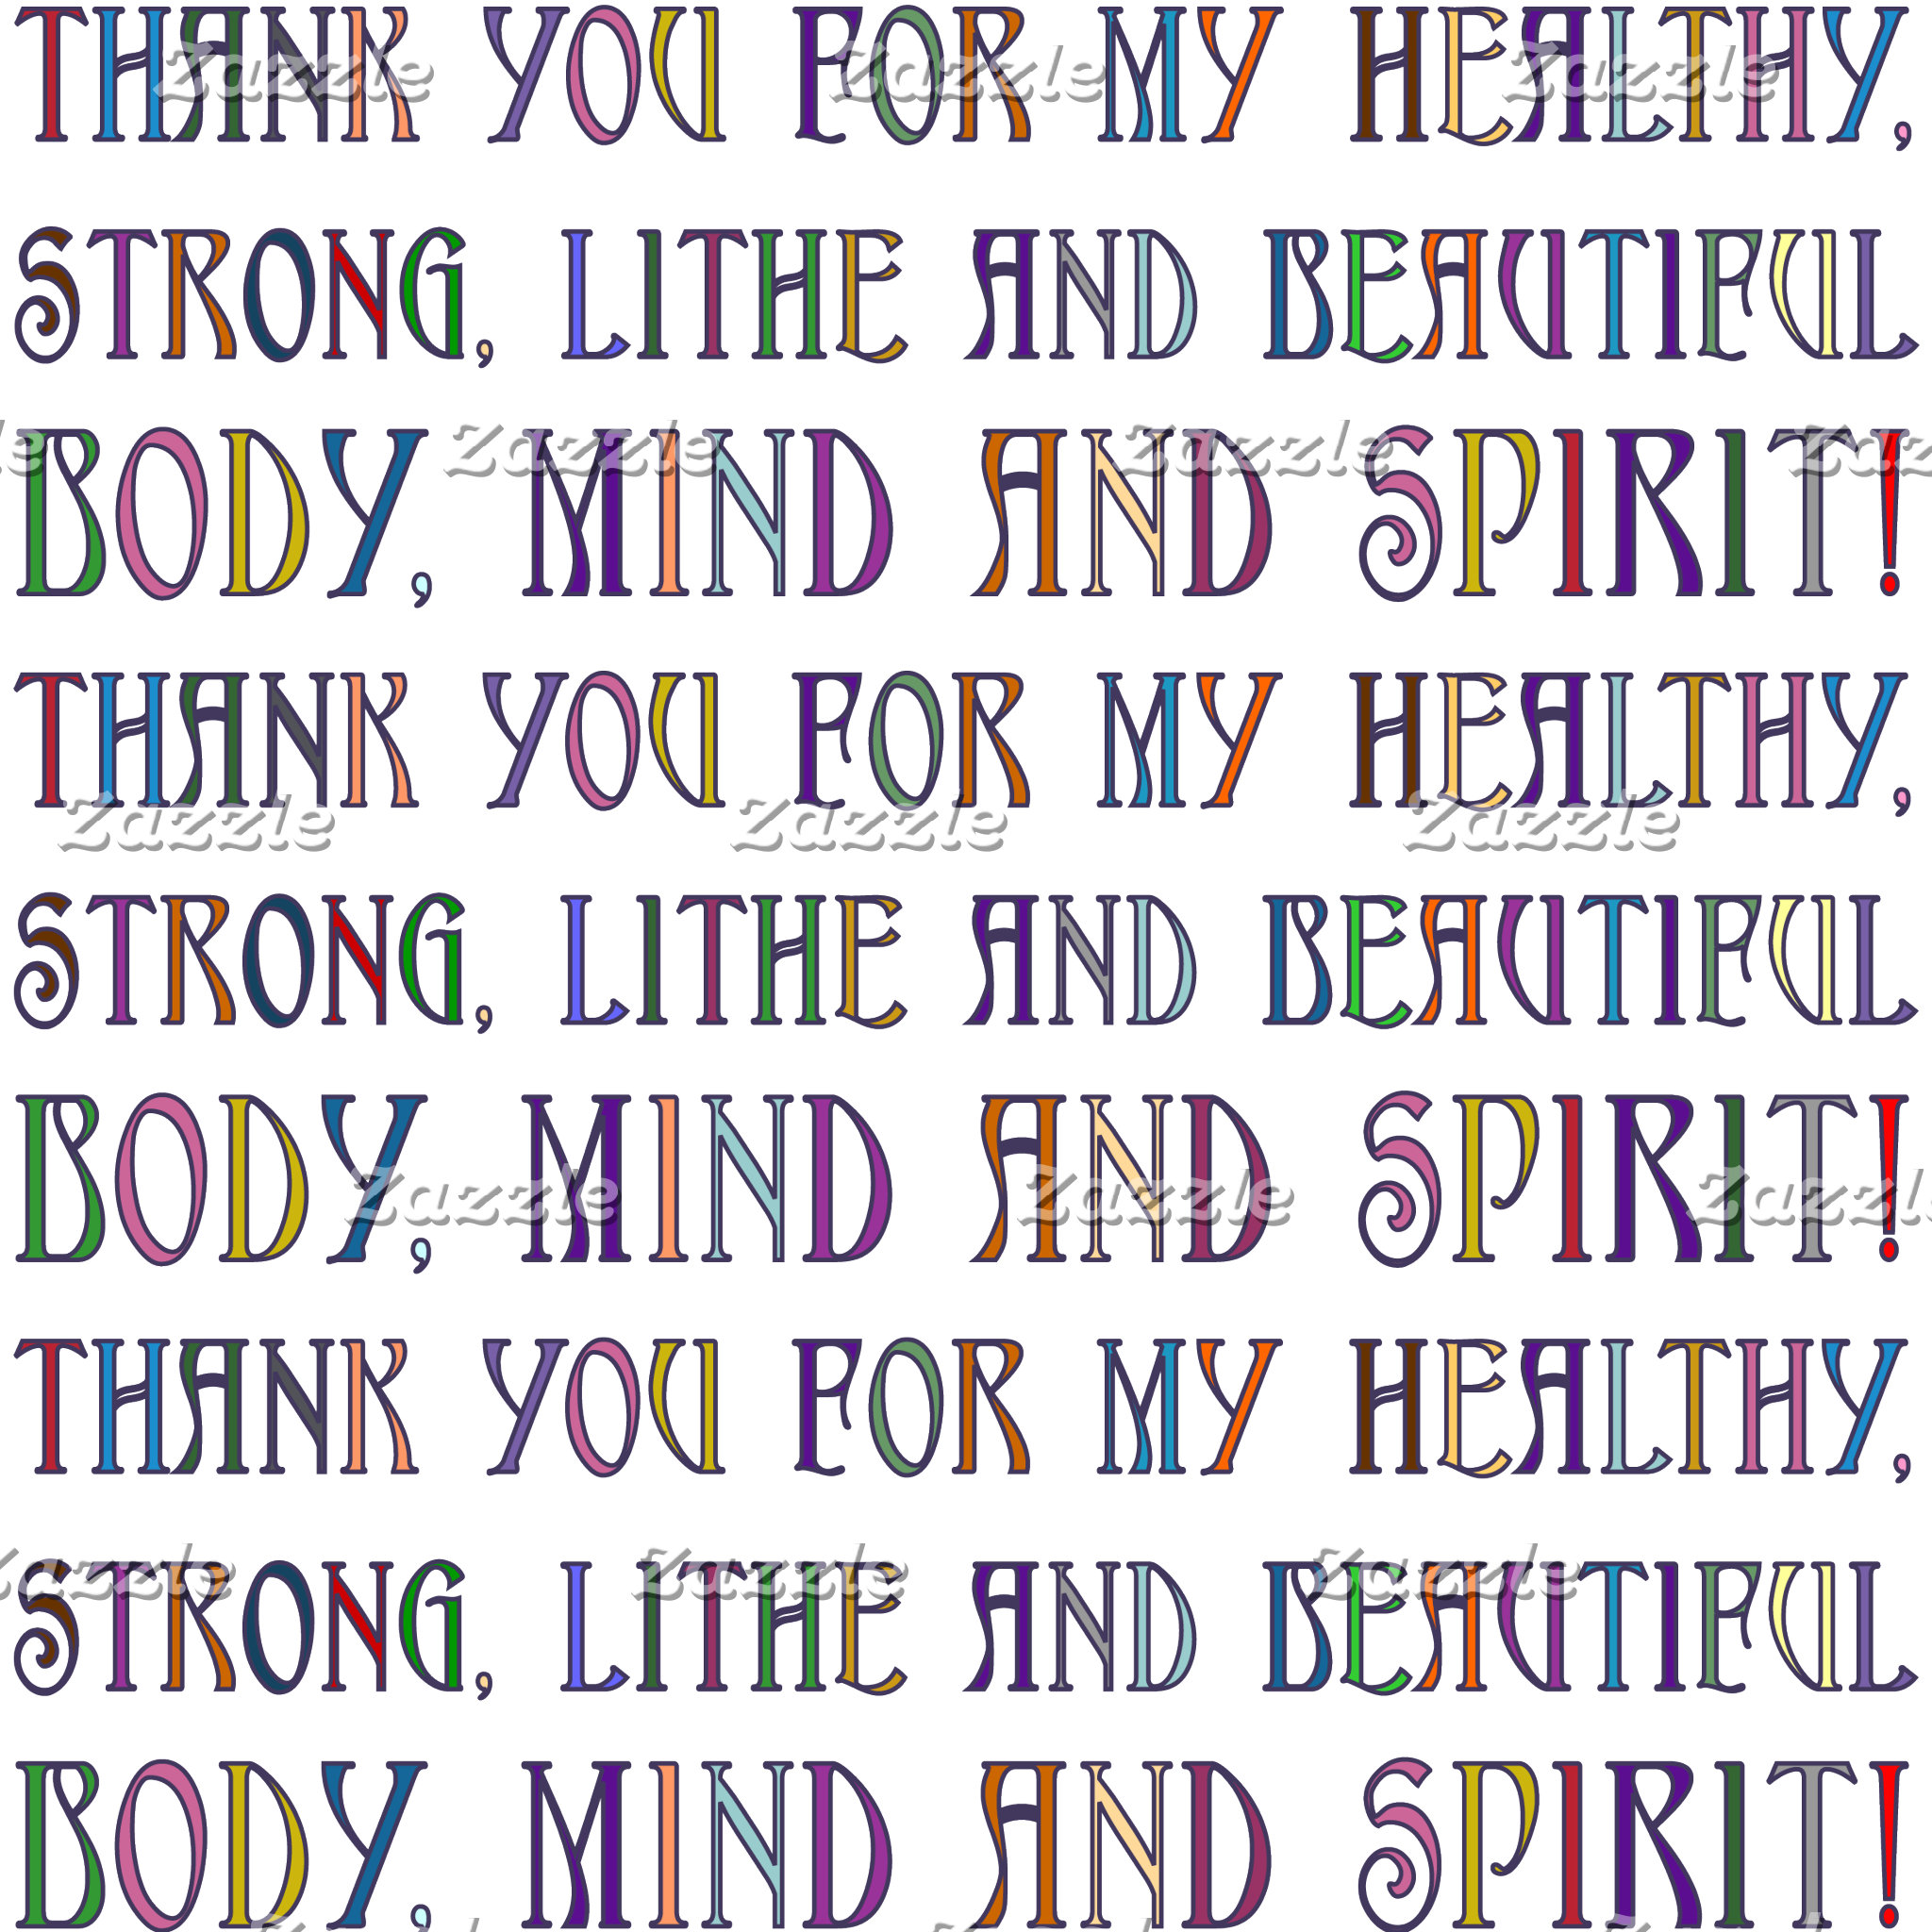 Body, Mind & Spirit!